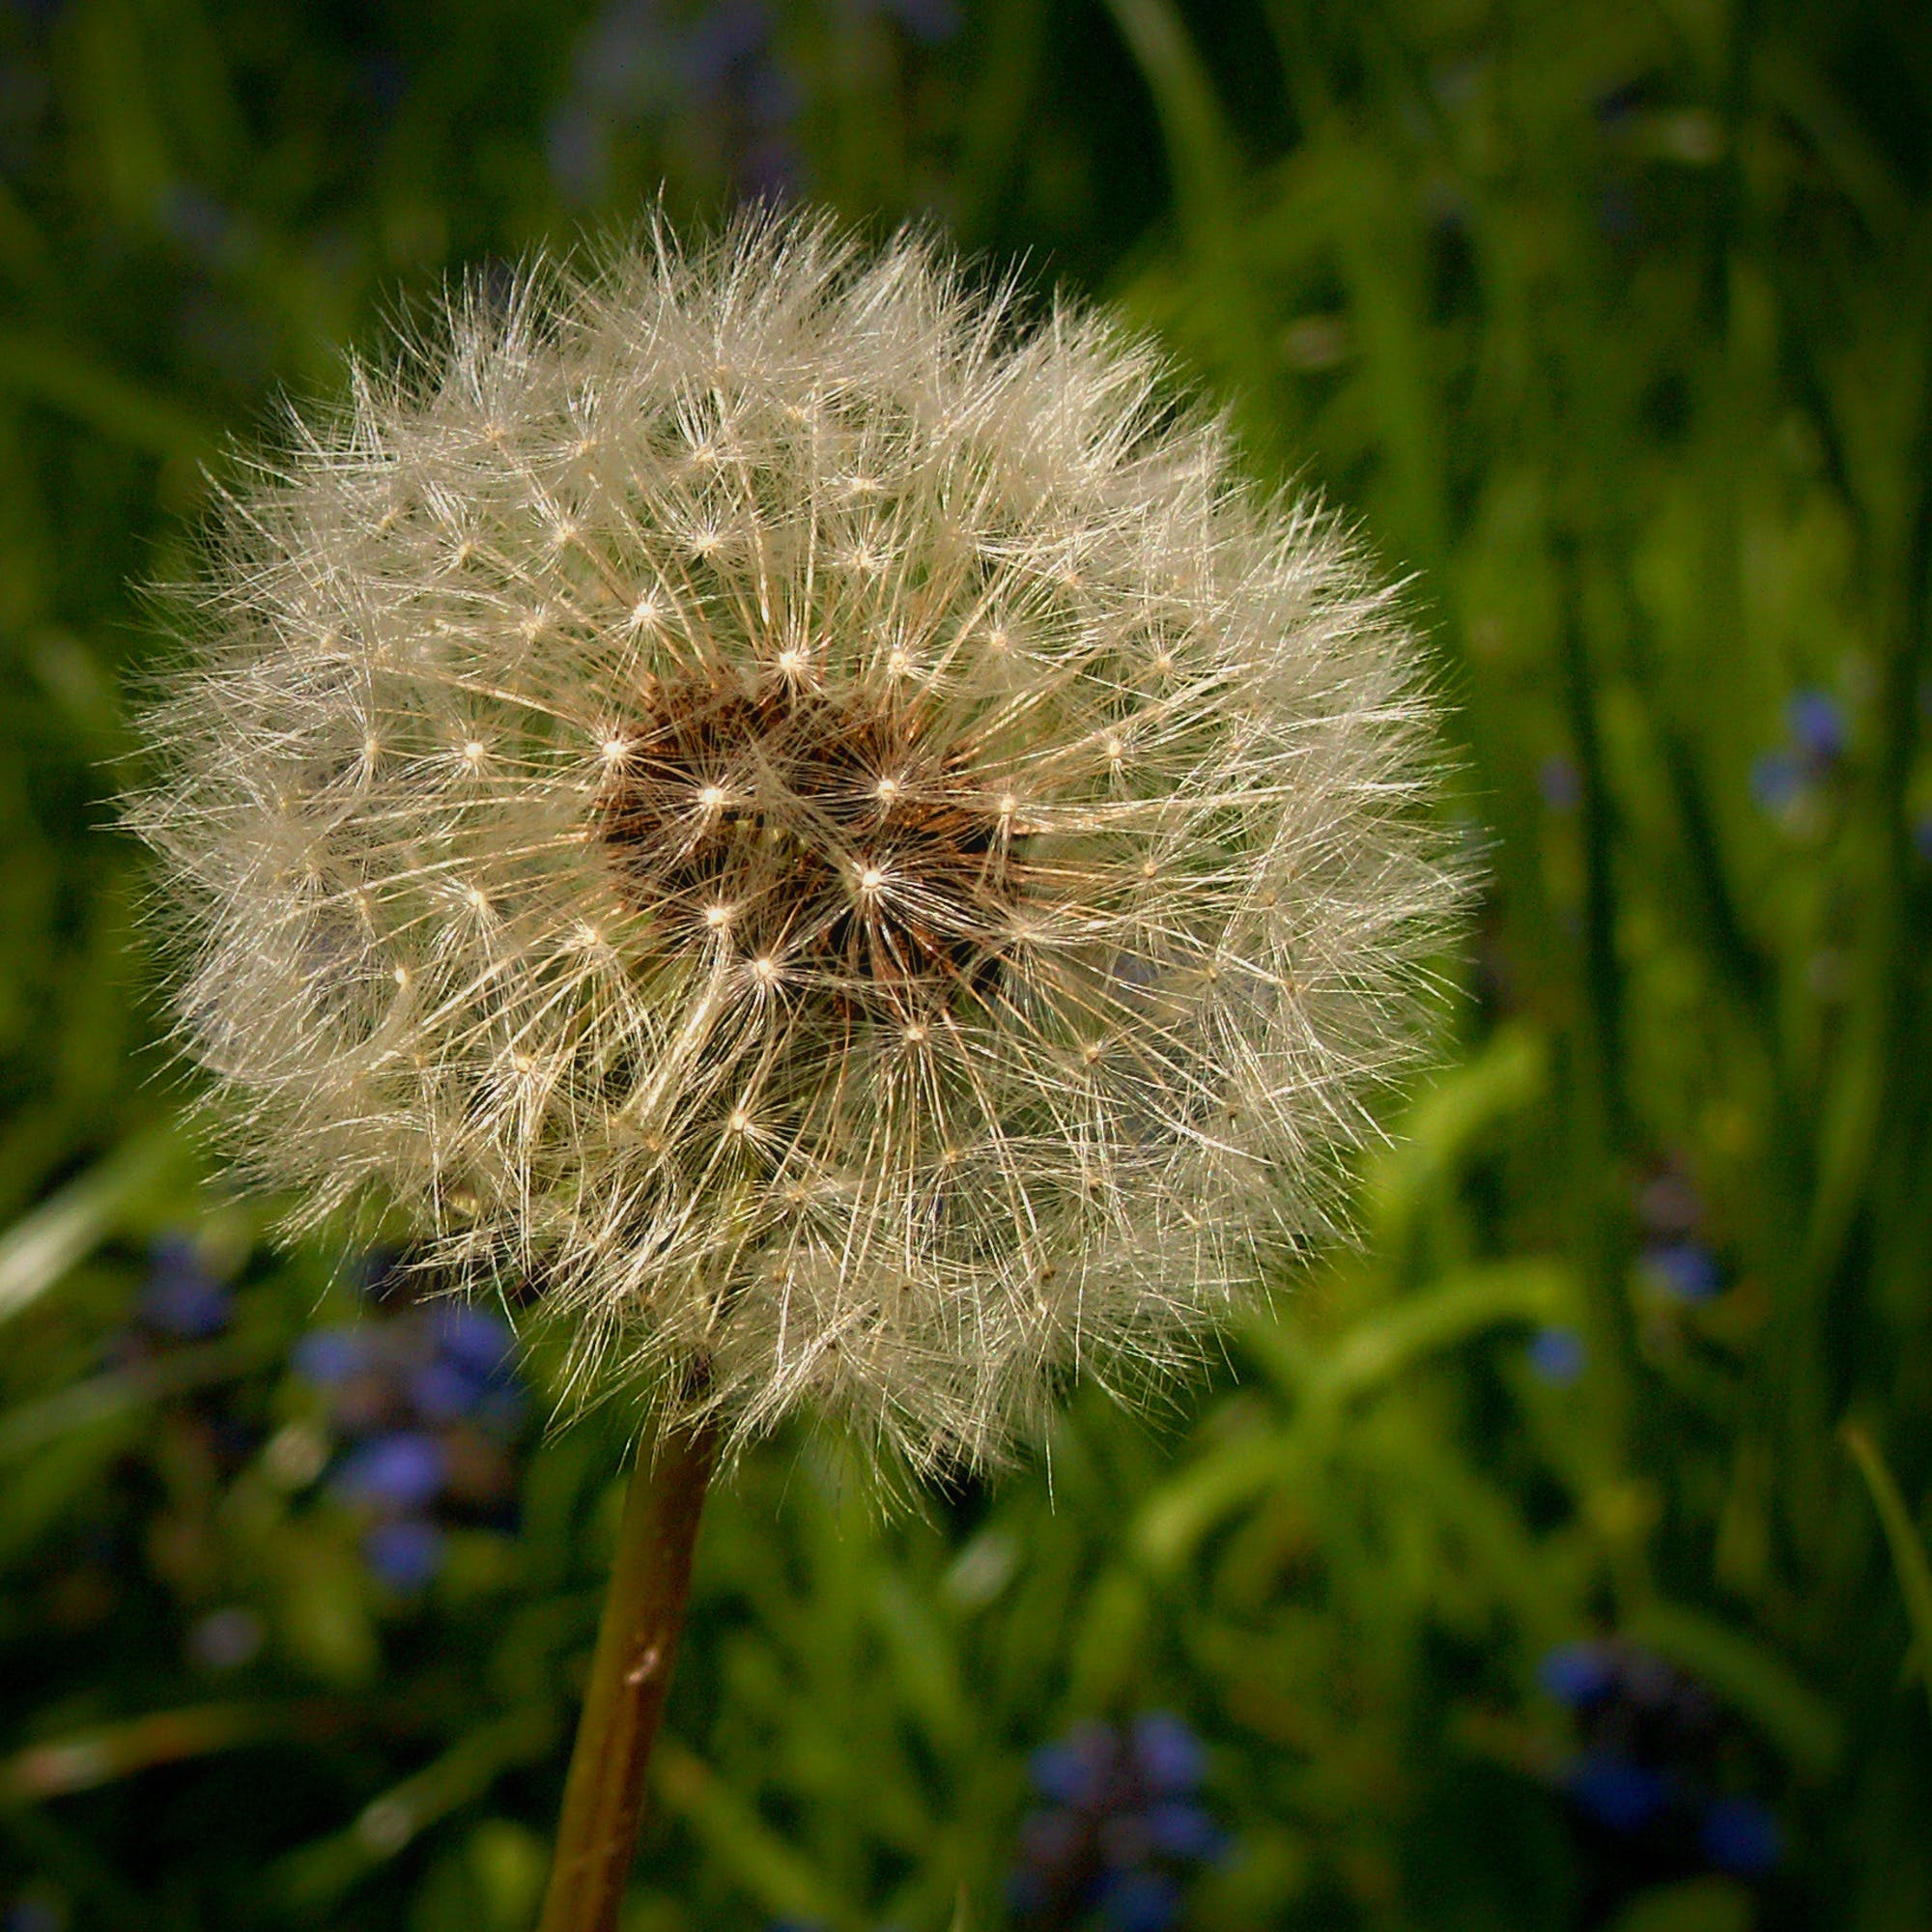 Dandelion in Focus Photography